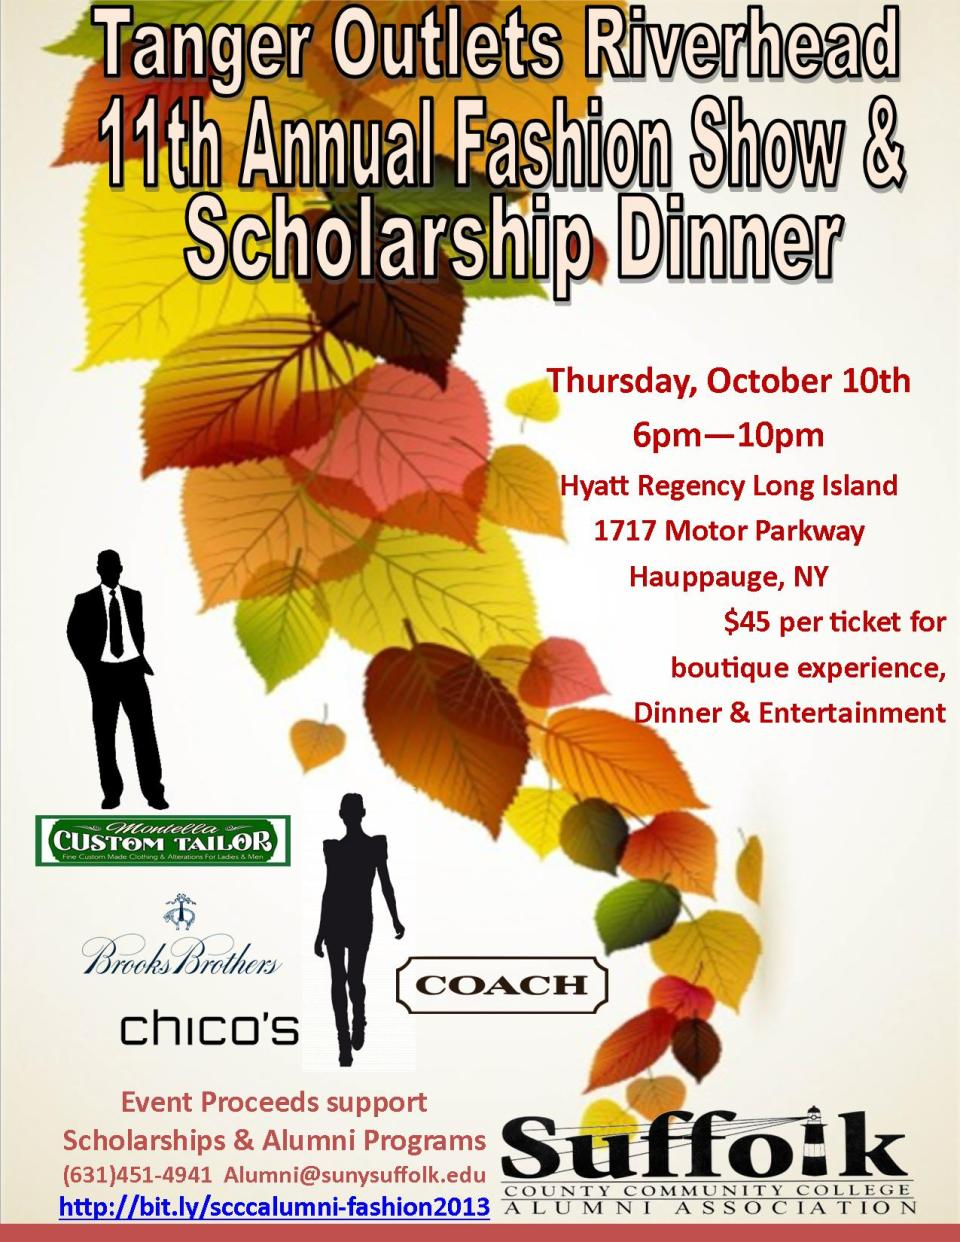 Dinner suffolk county community college alumni for Hyatt regency long island 1717 motor parkway hauppauge ny 11788